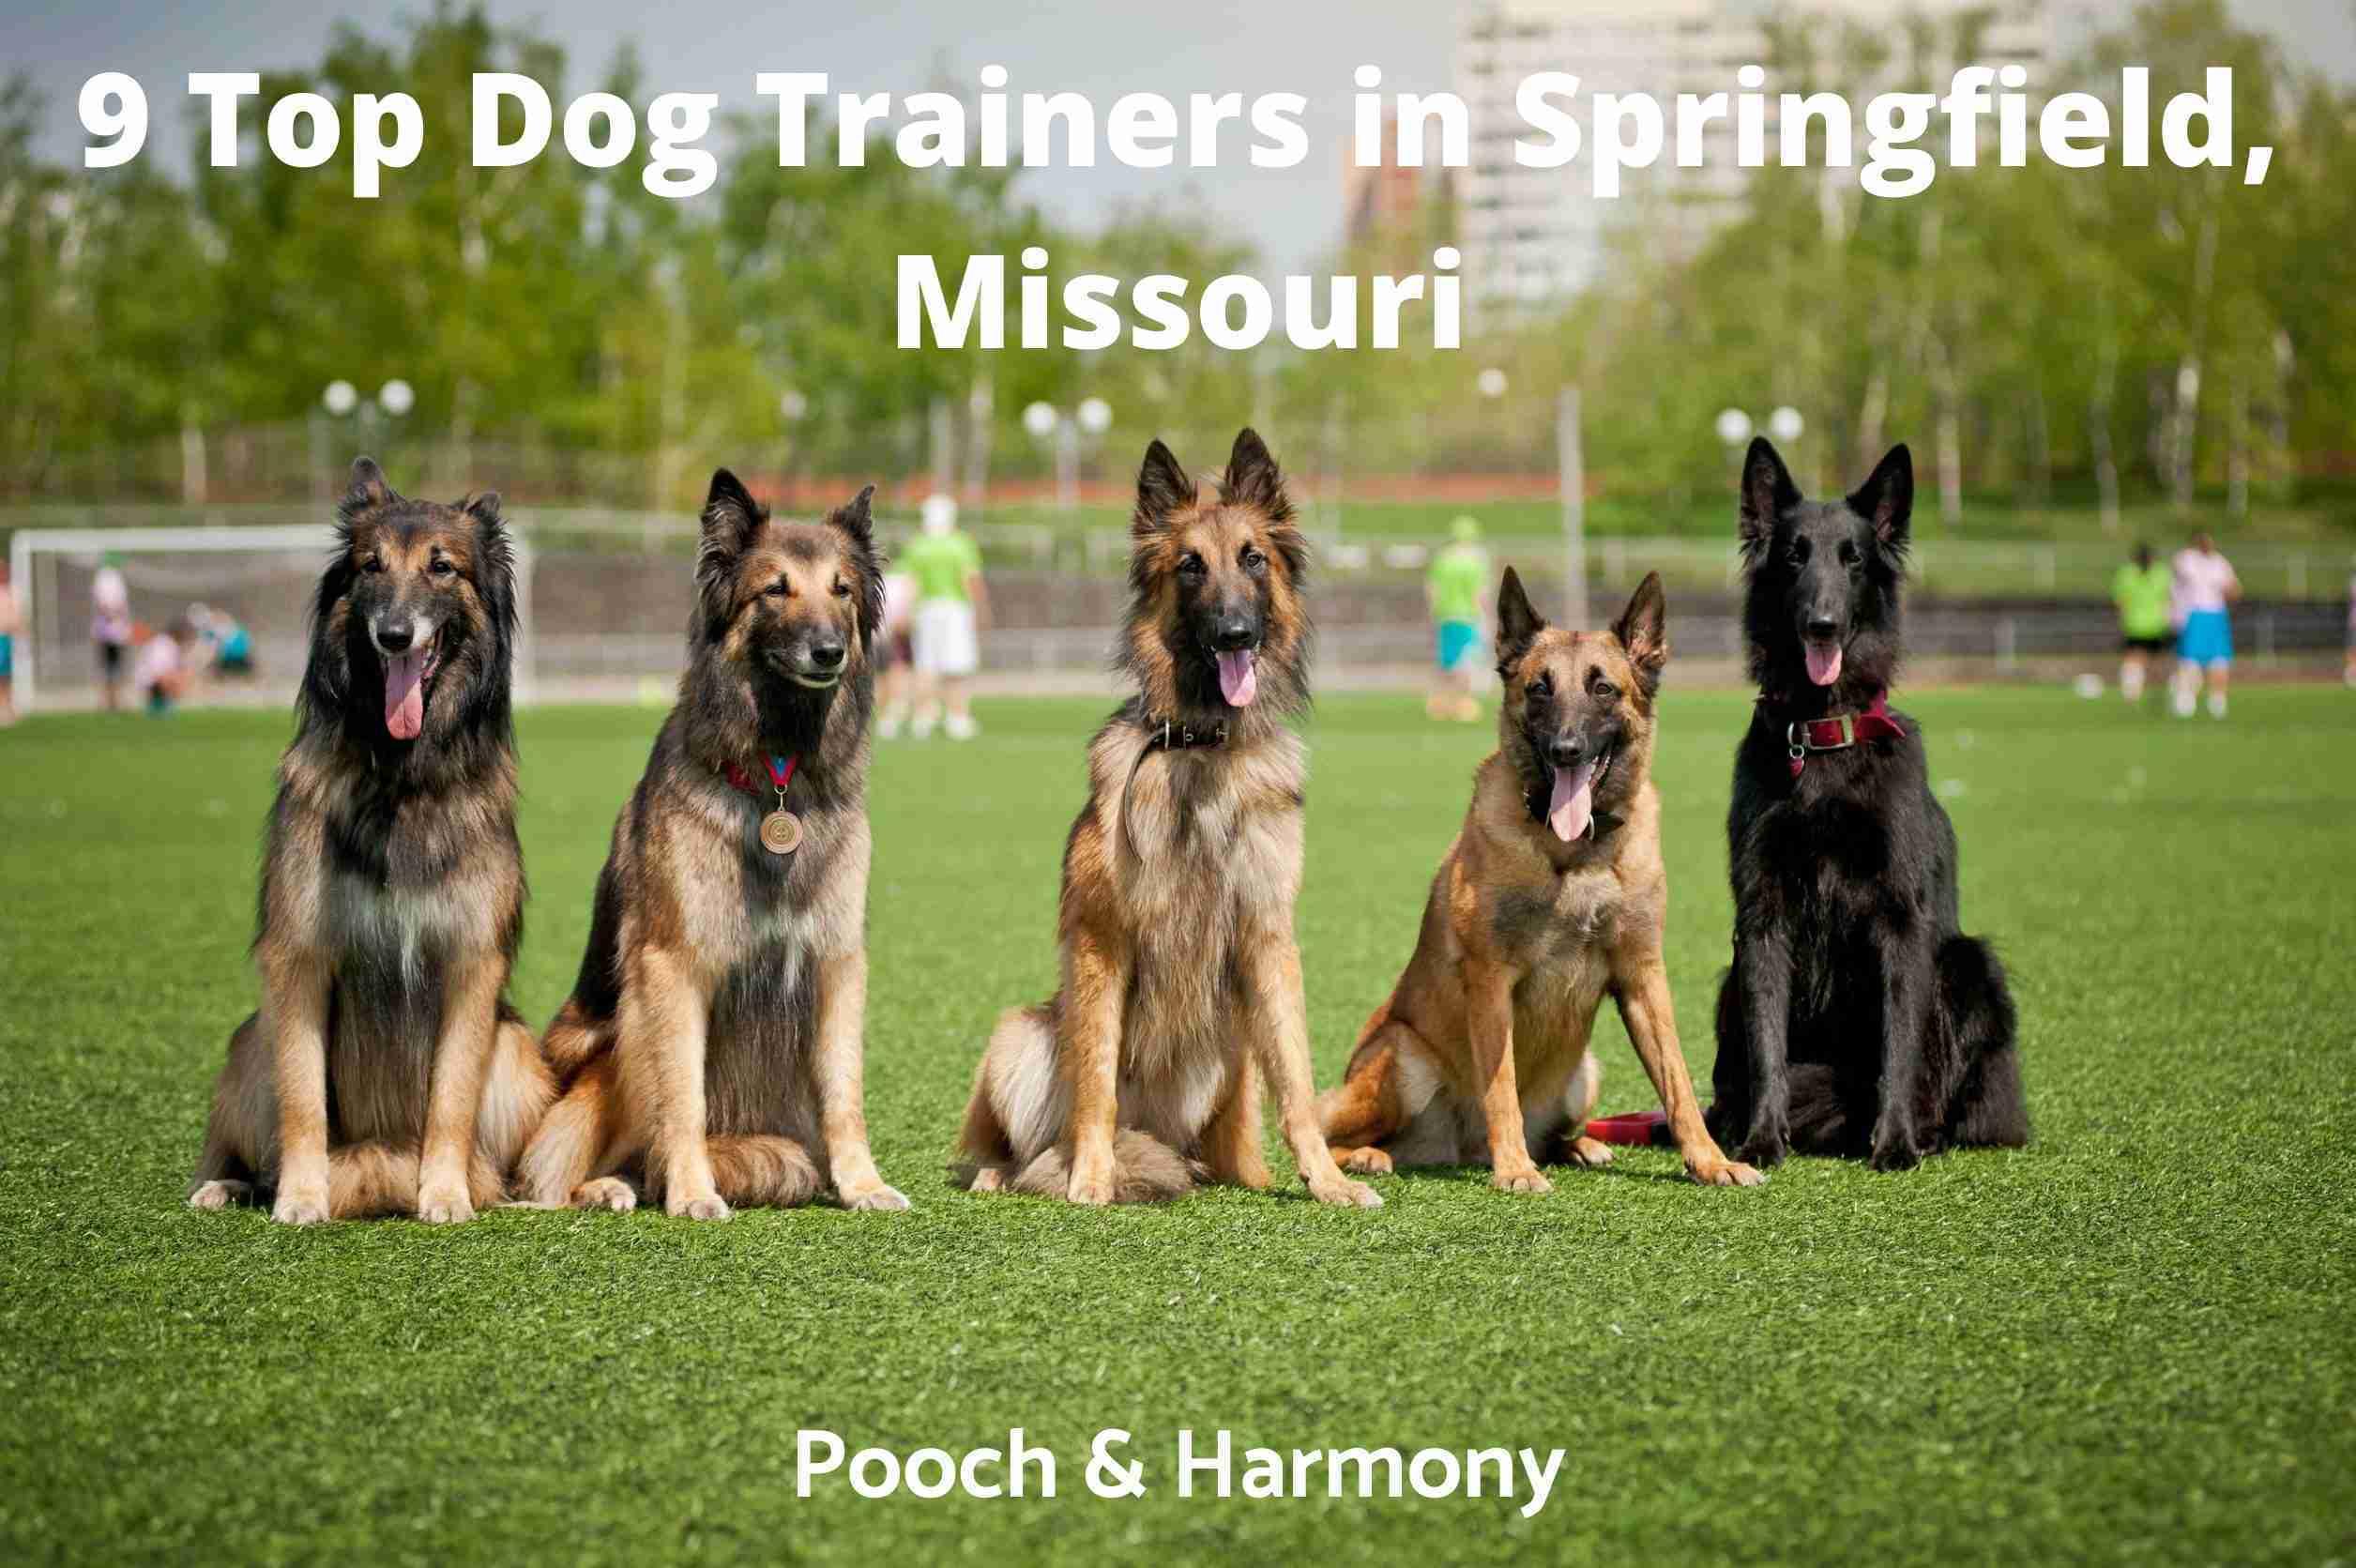 Dog Trainers in Springfield, Missouri